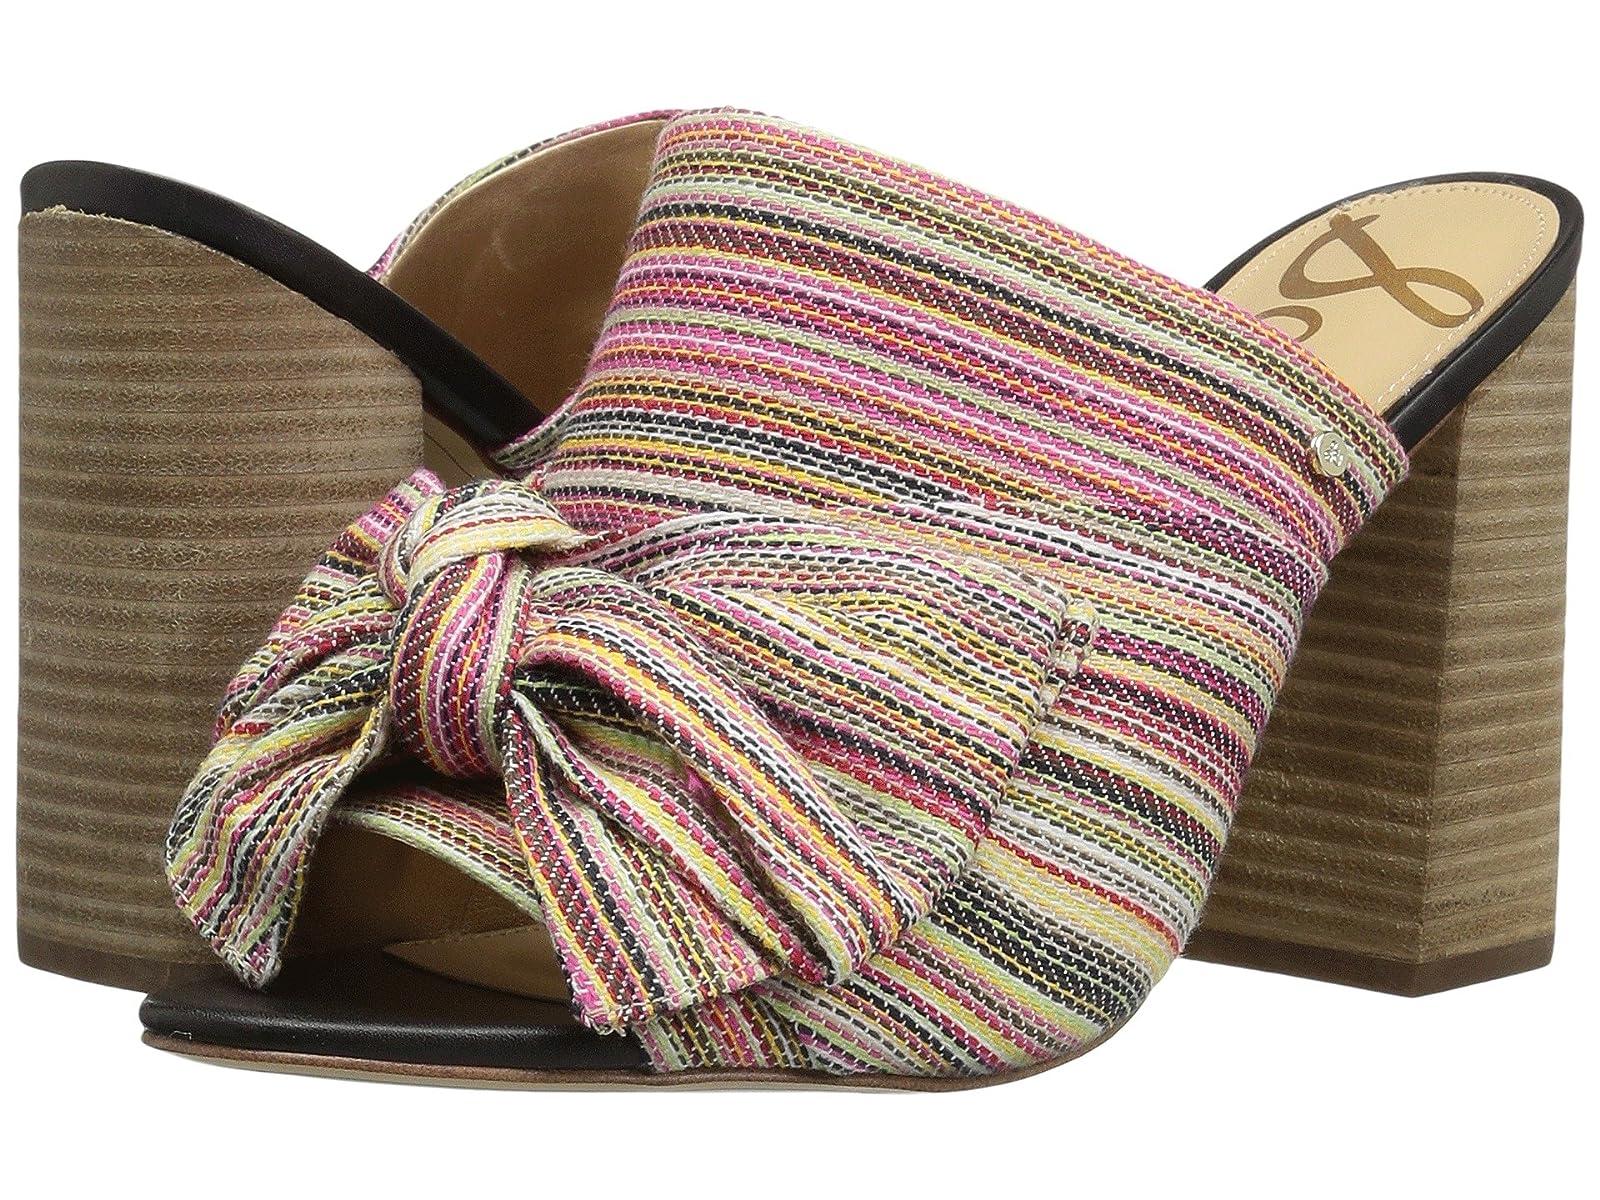 Sam Edelman YumiCheap and distinctive eye-catching shoes